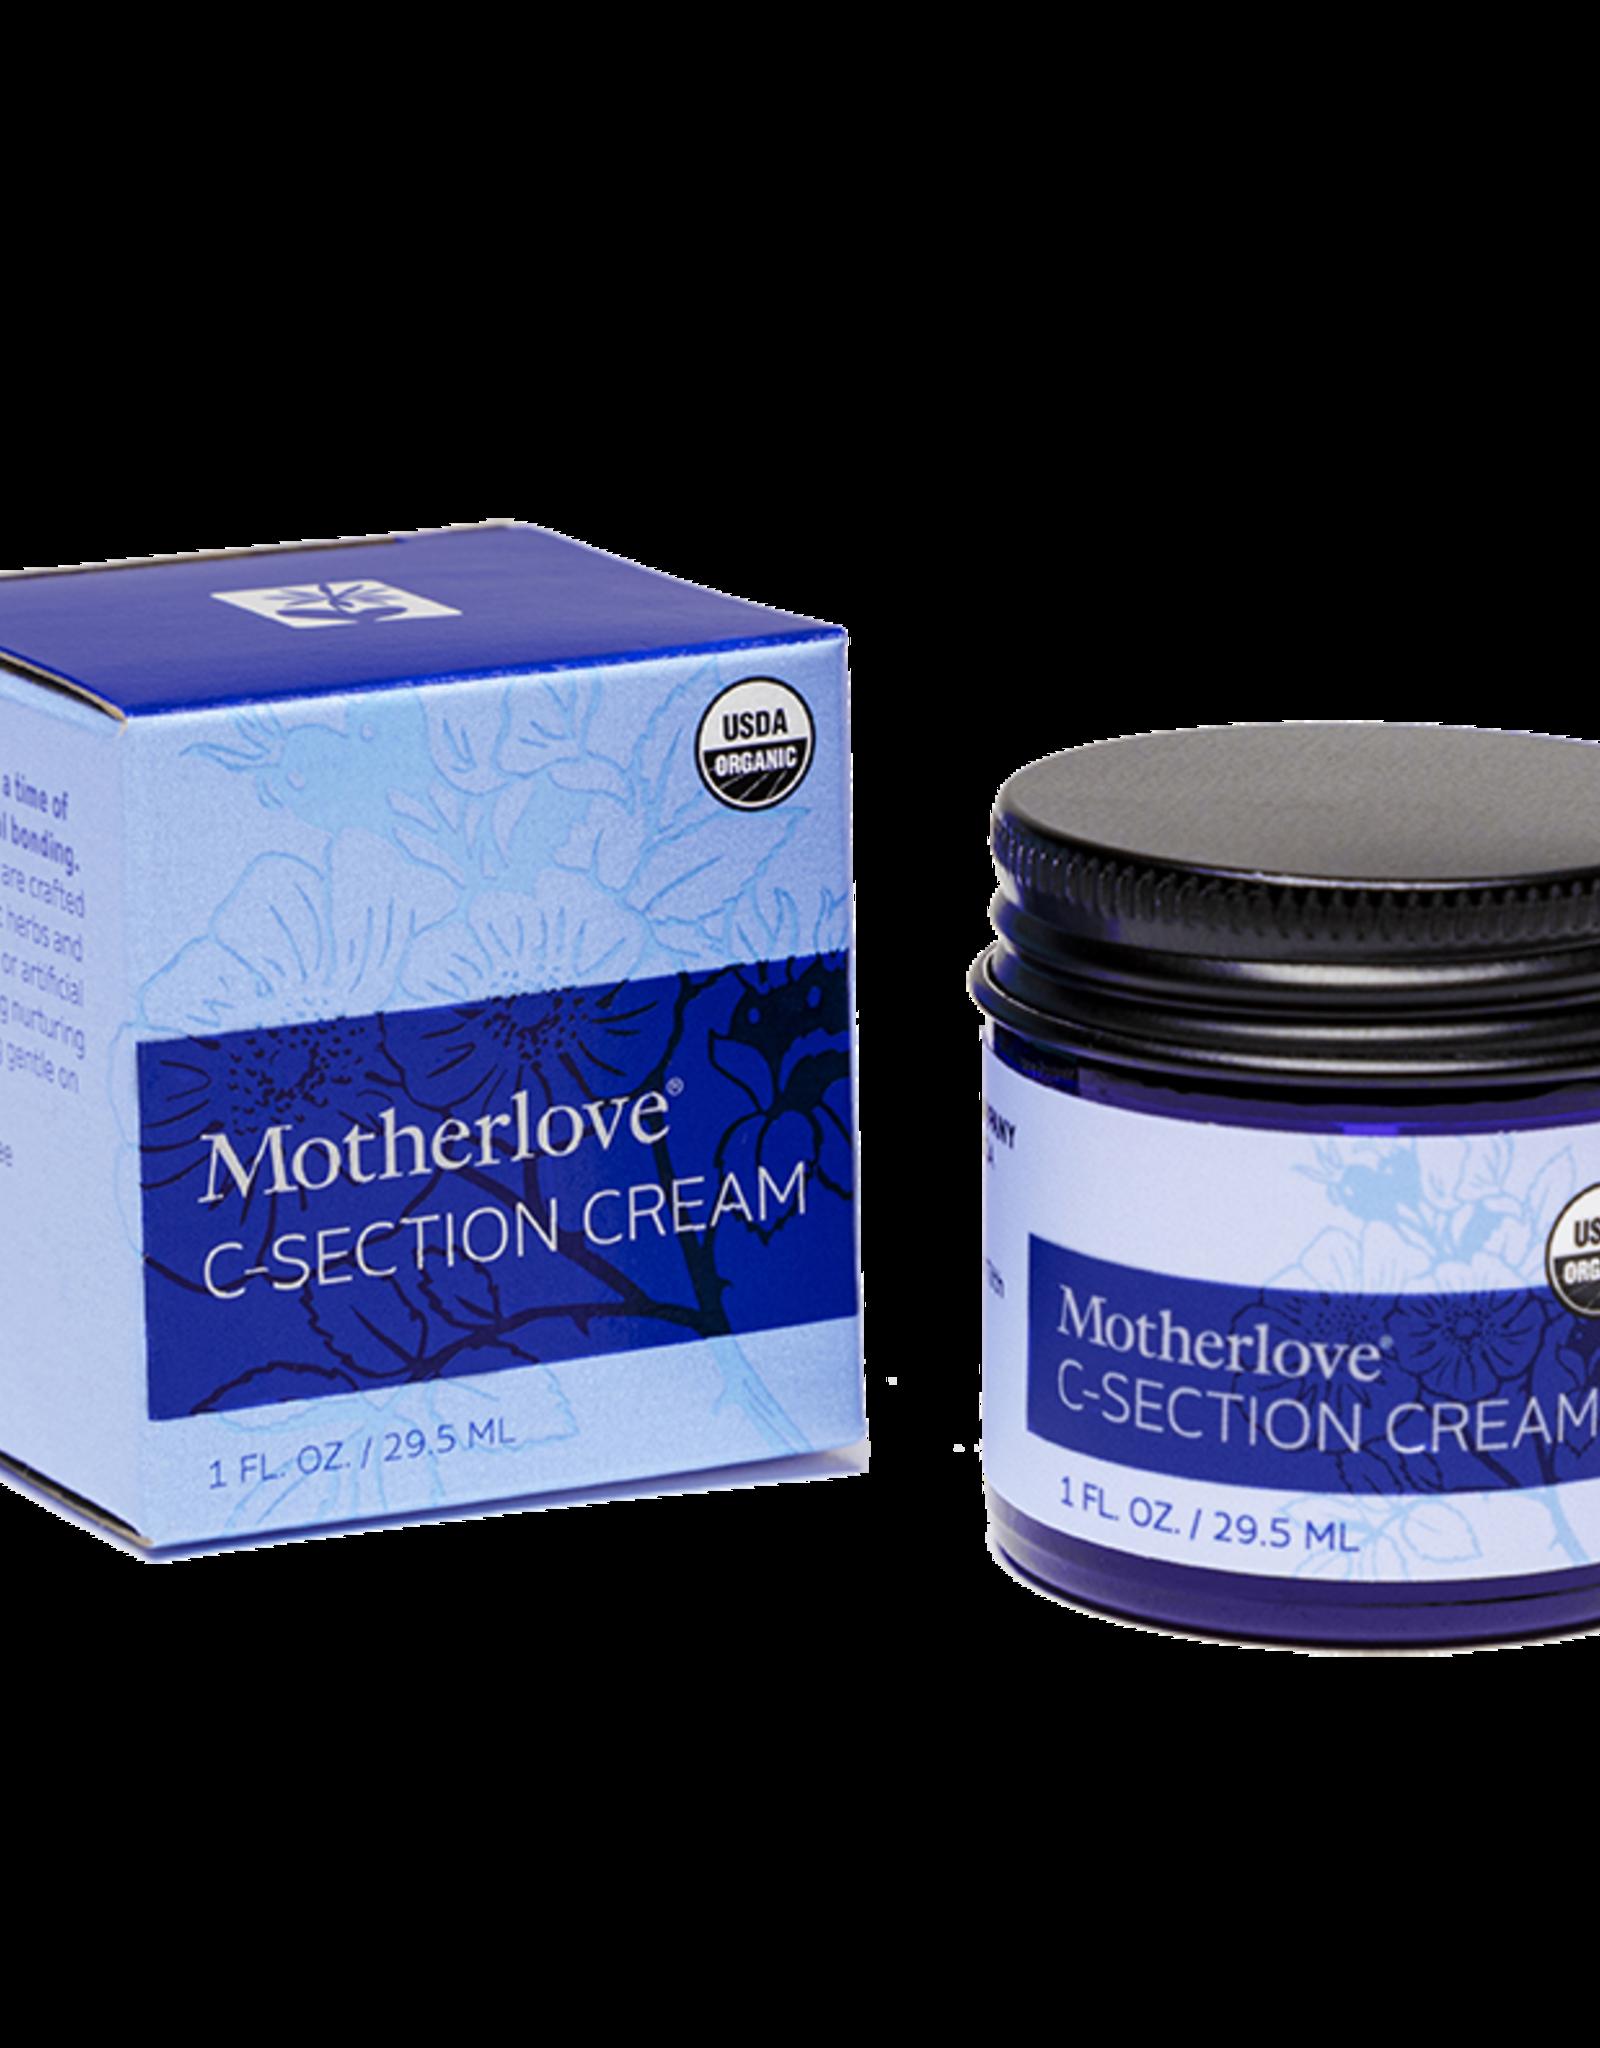 Motherlove C-Section Cream 1 oz.